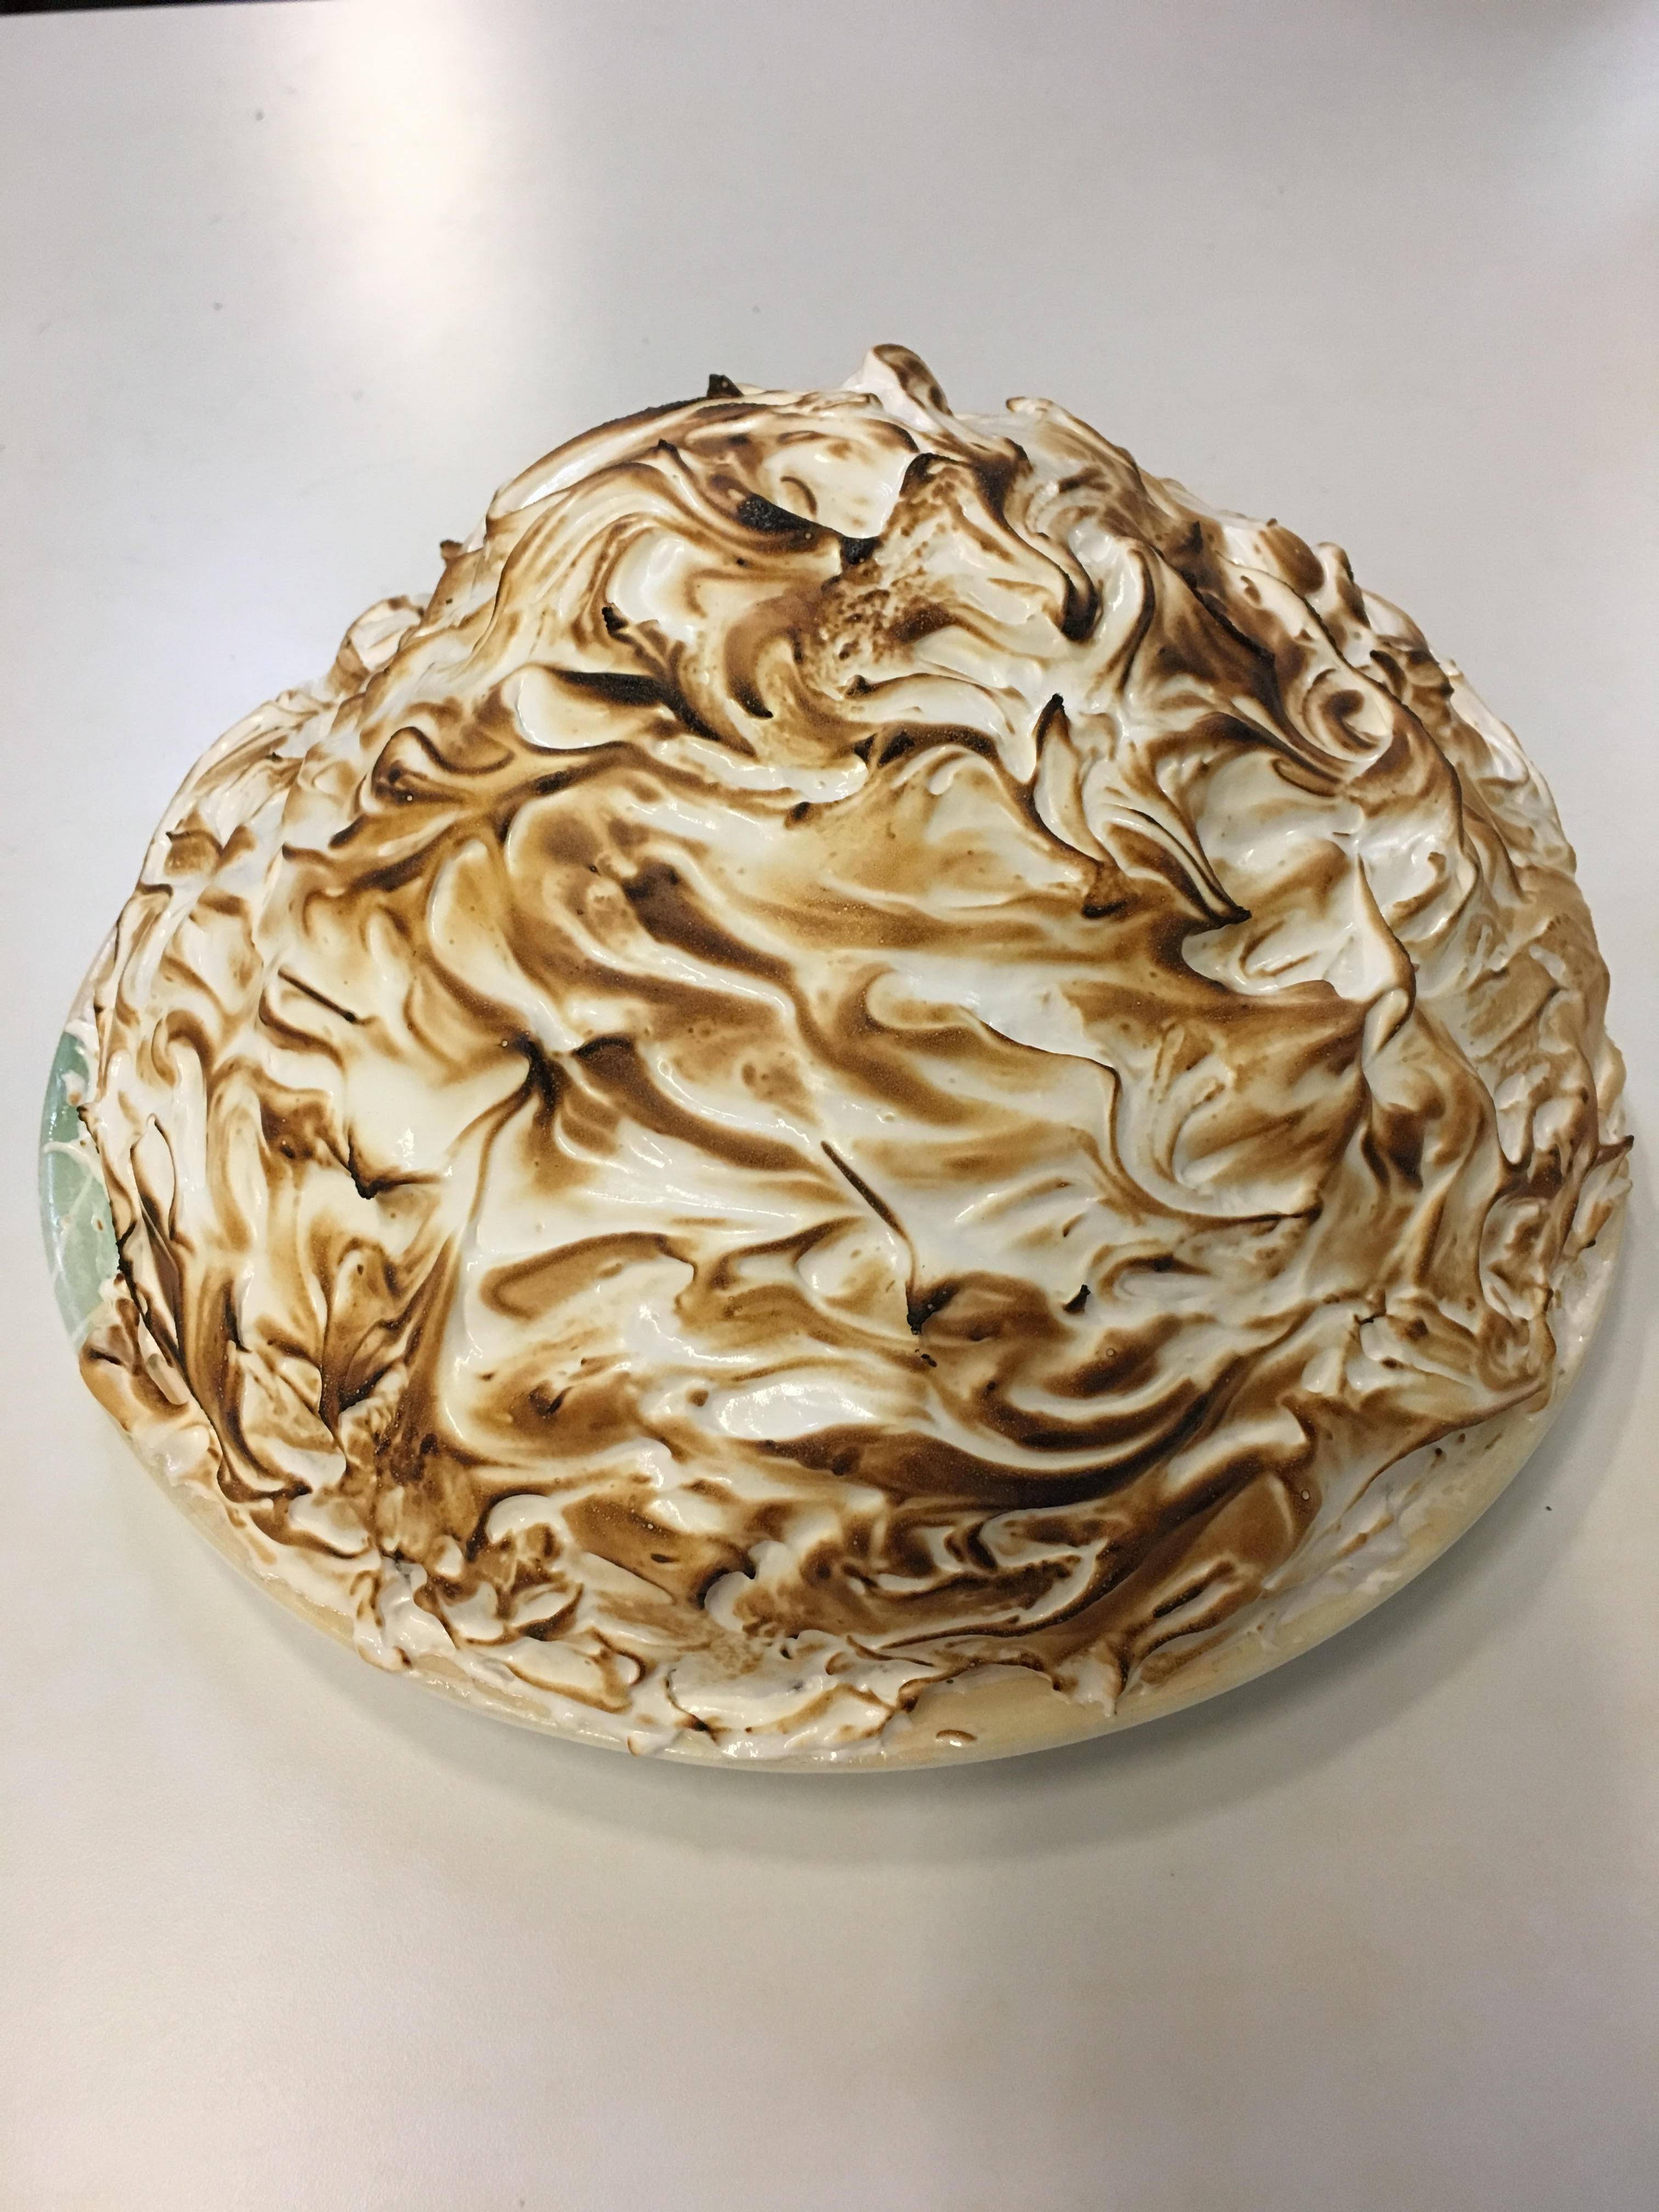 Baked Alaska.